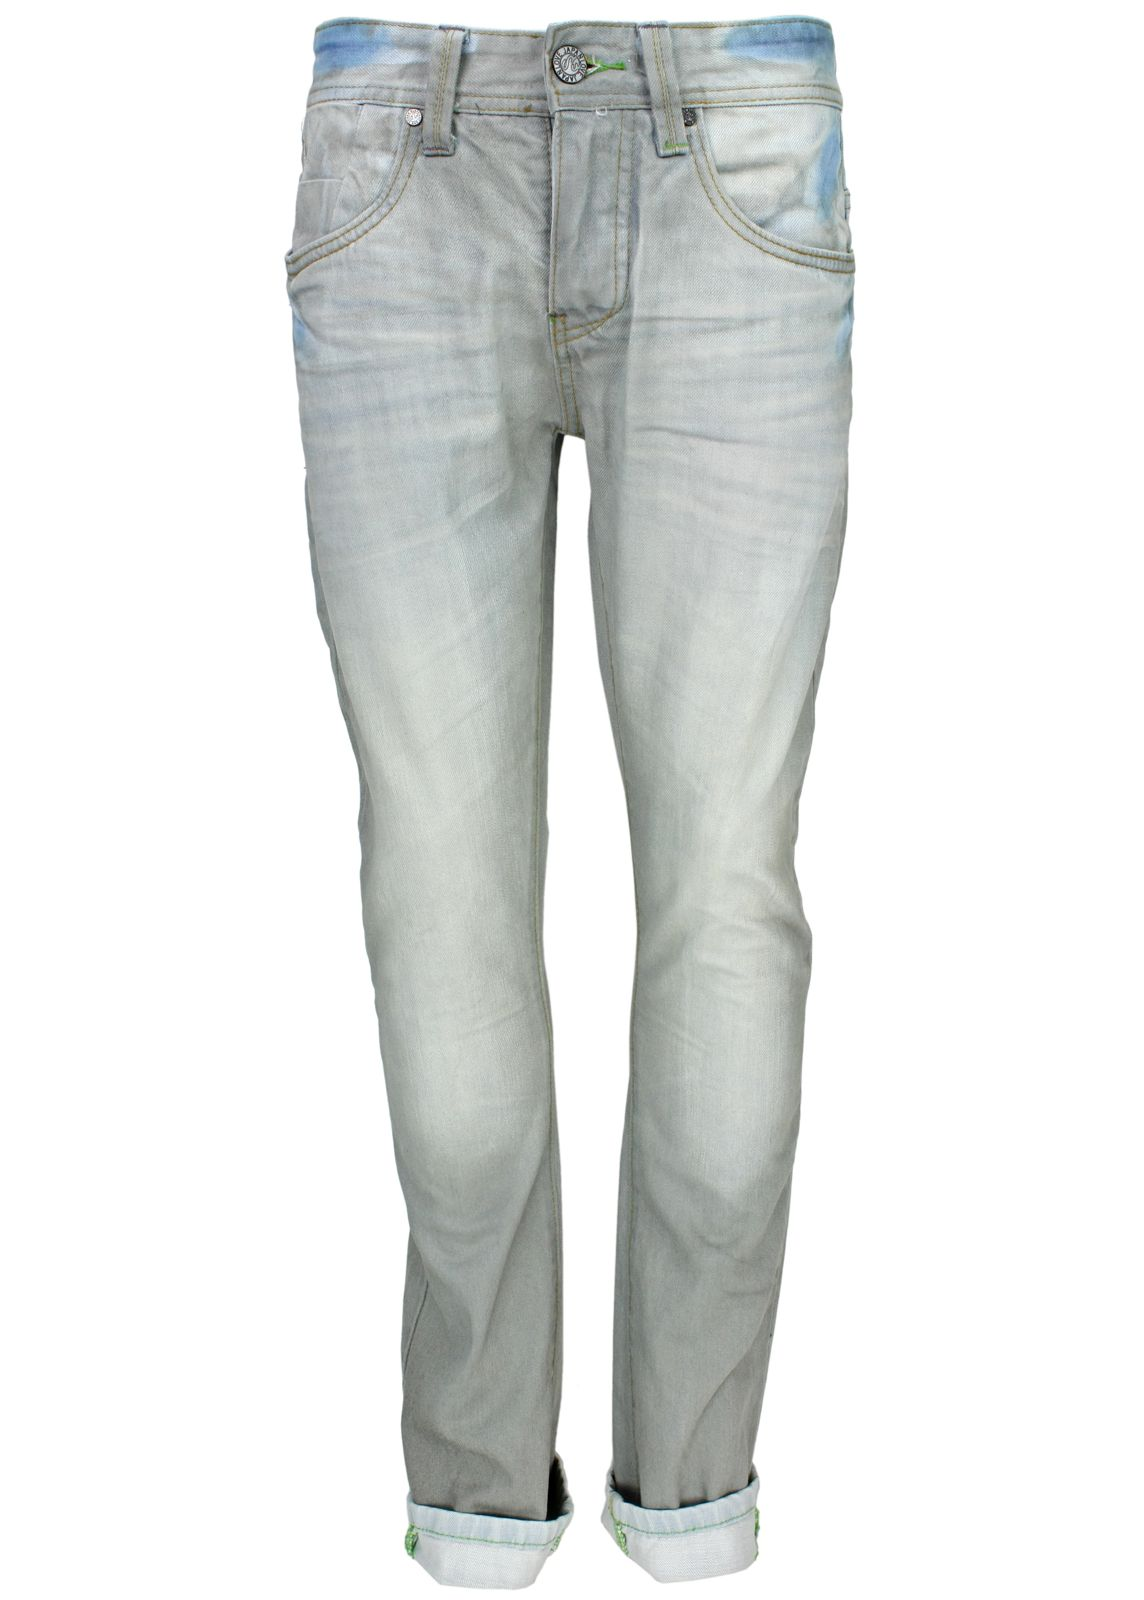 one green elephant jeans columbus blue grey fettebeute online shop. Black Bedroom Furniture Sets. Home Design Ideas